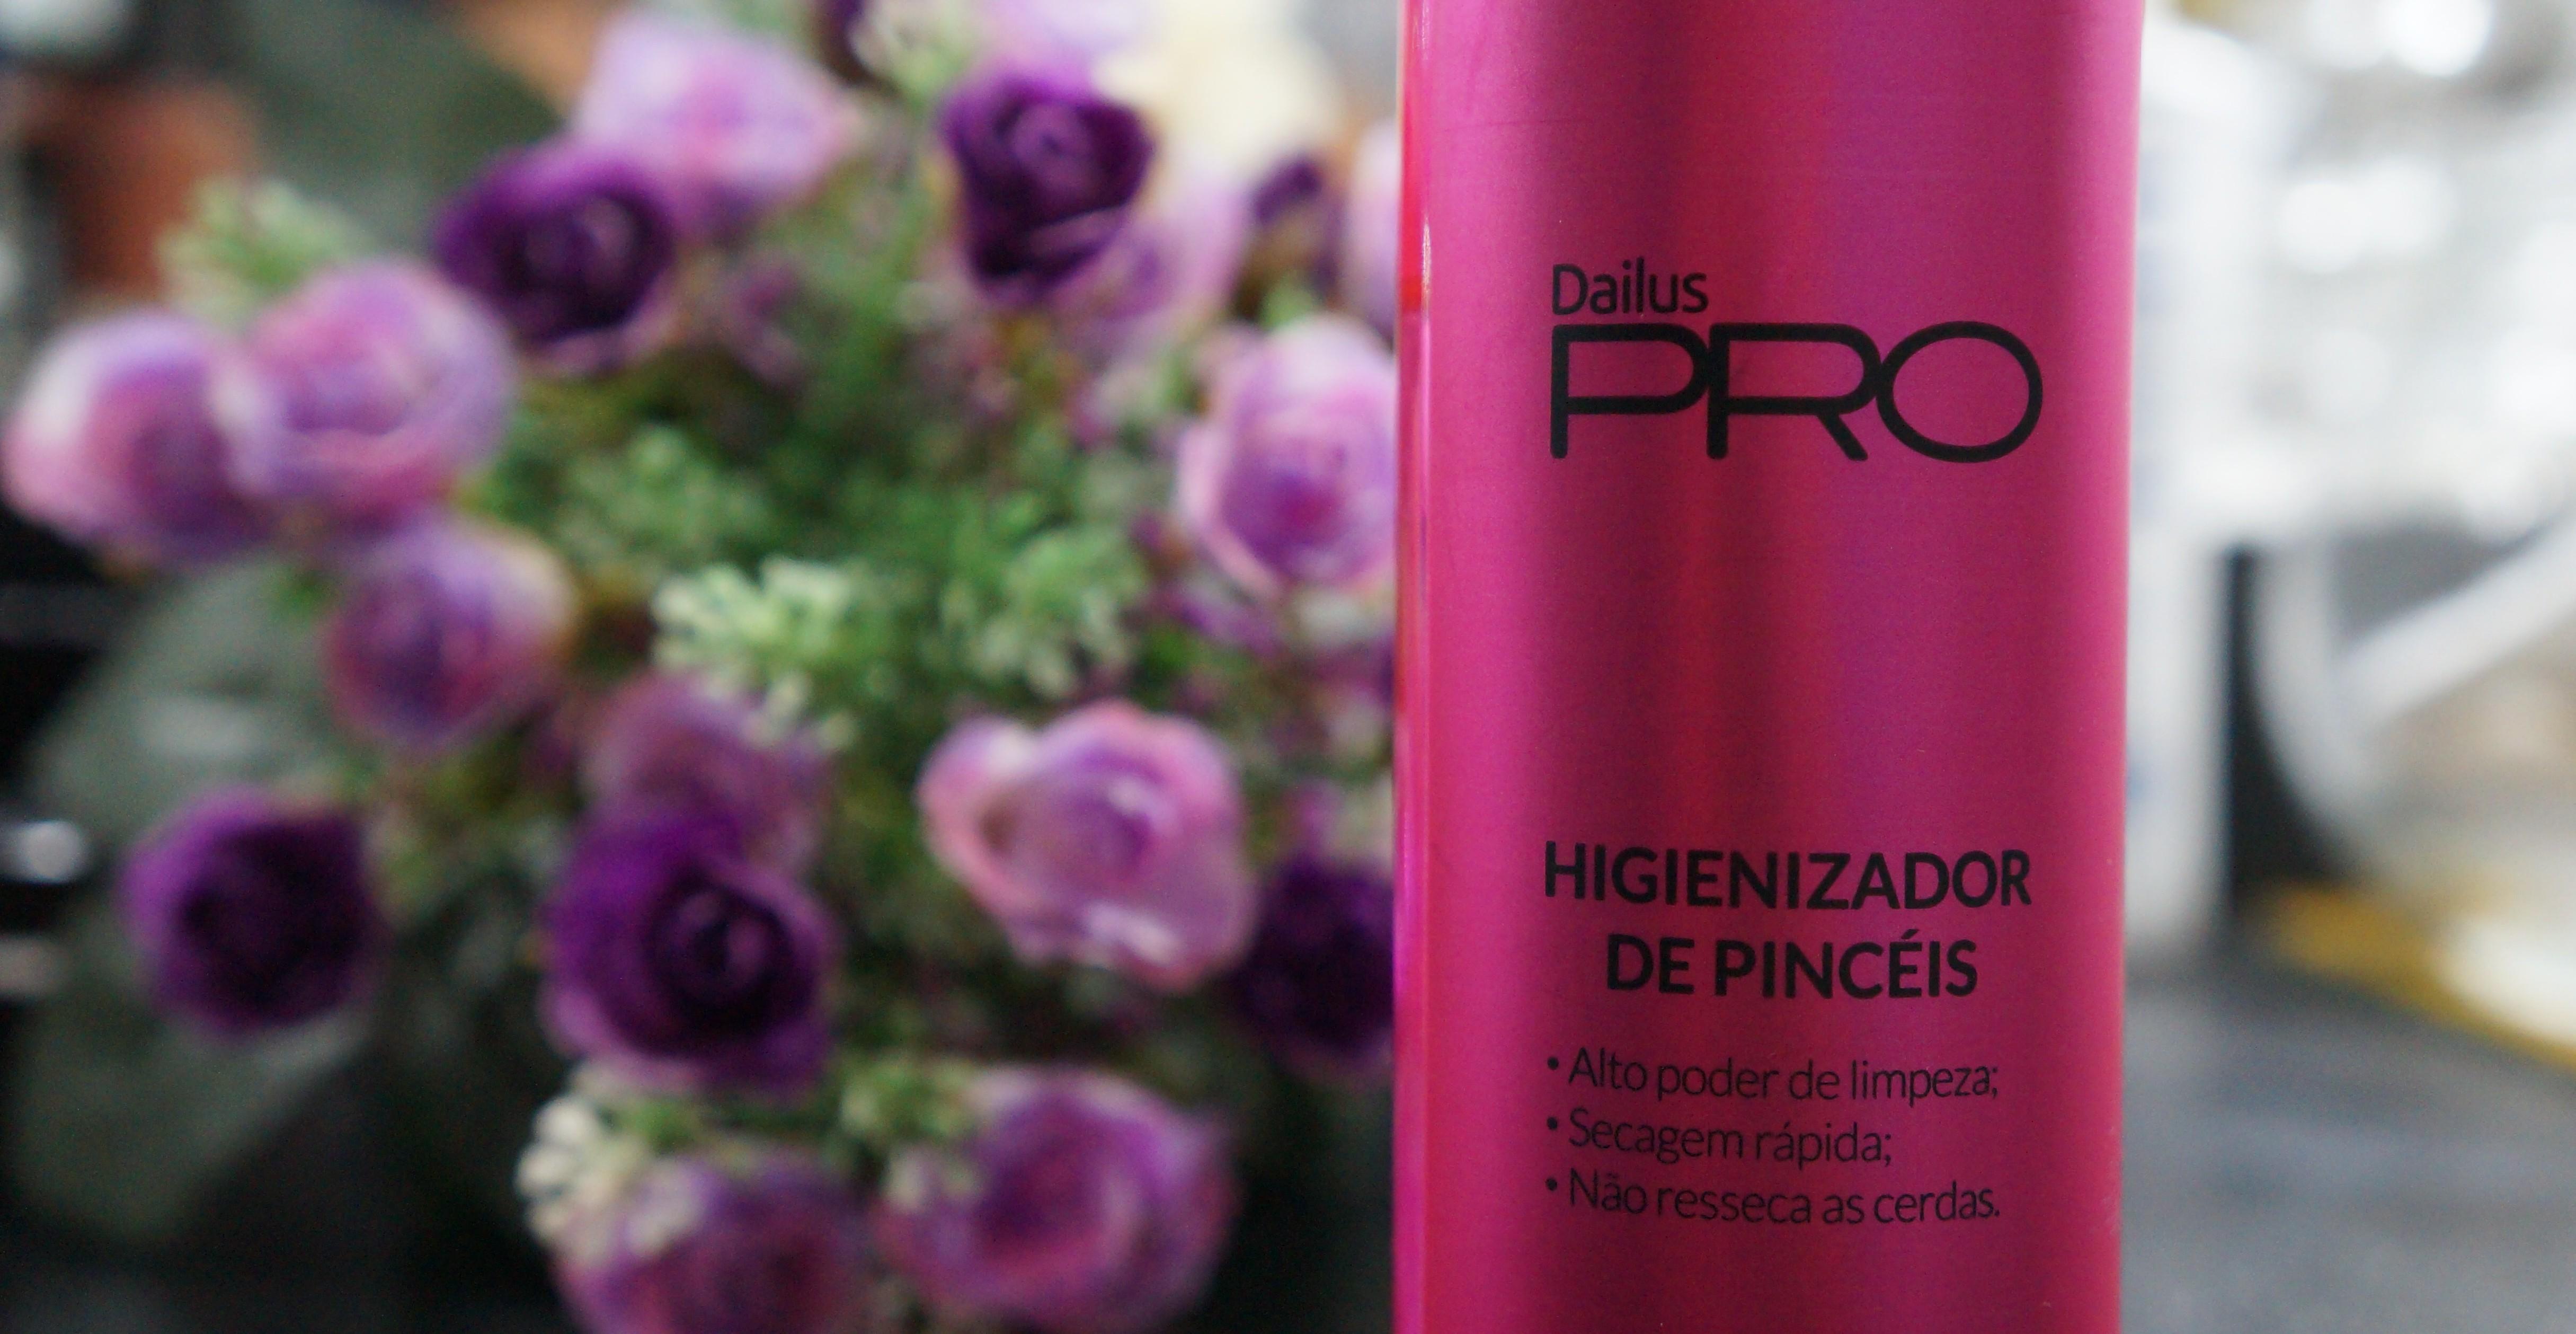 Higienizador de pincéis Dailus Pro – Resenha